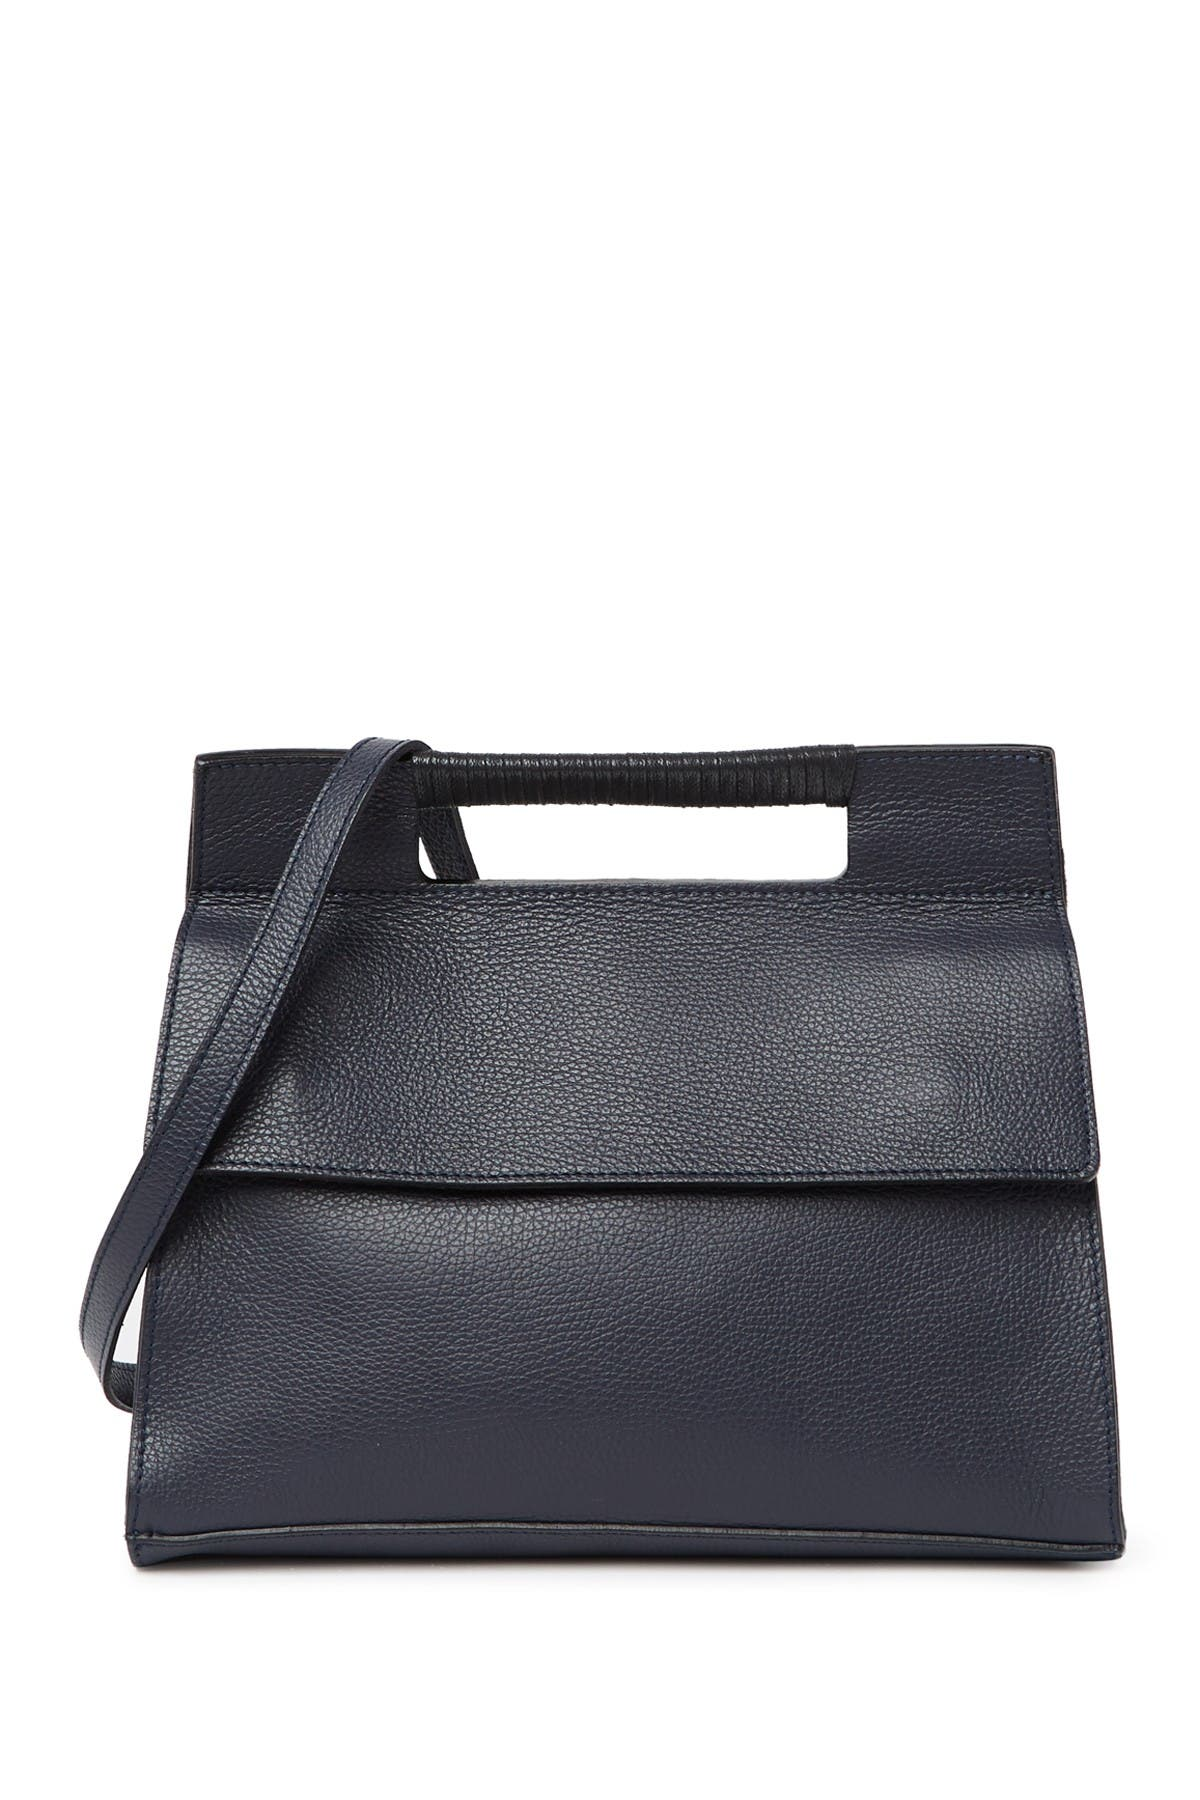 Image of Carla Ferreri Rectangle Handle Handbag